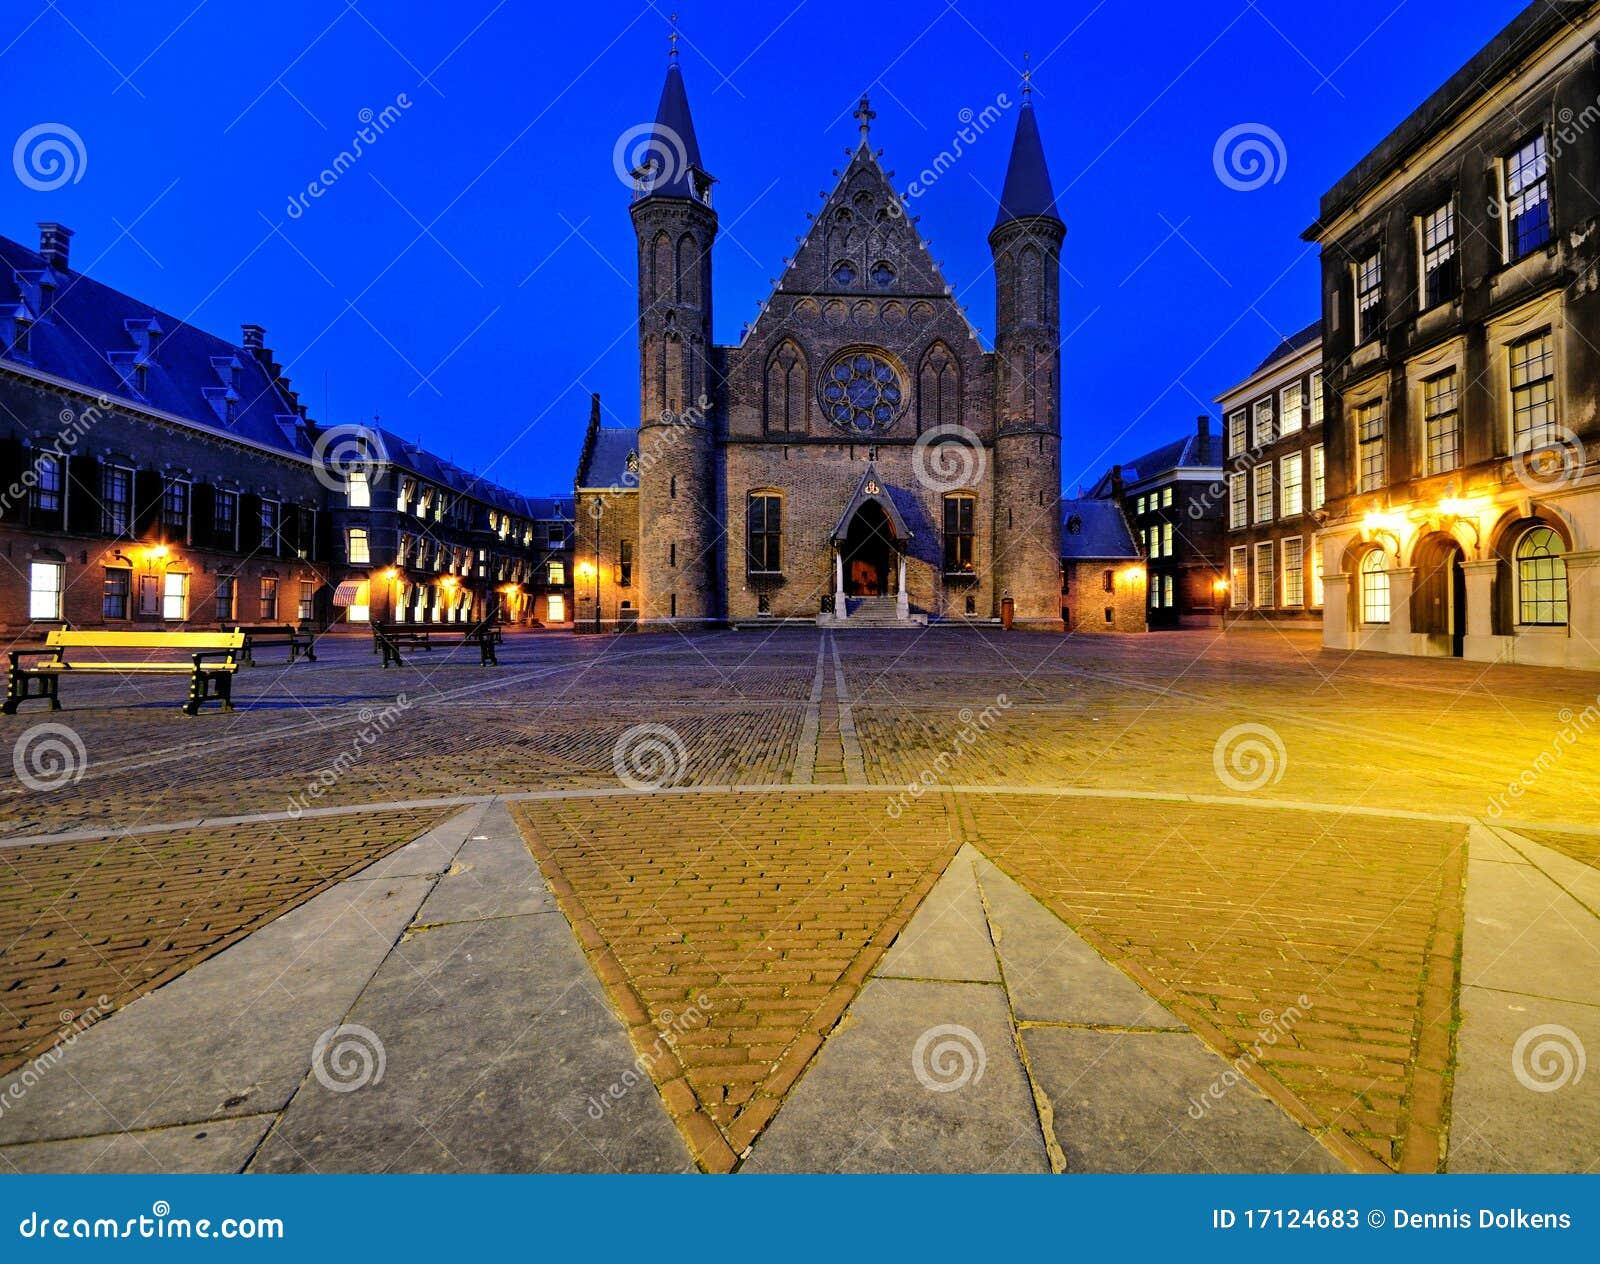 Binnenhof by Night, The Hague